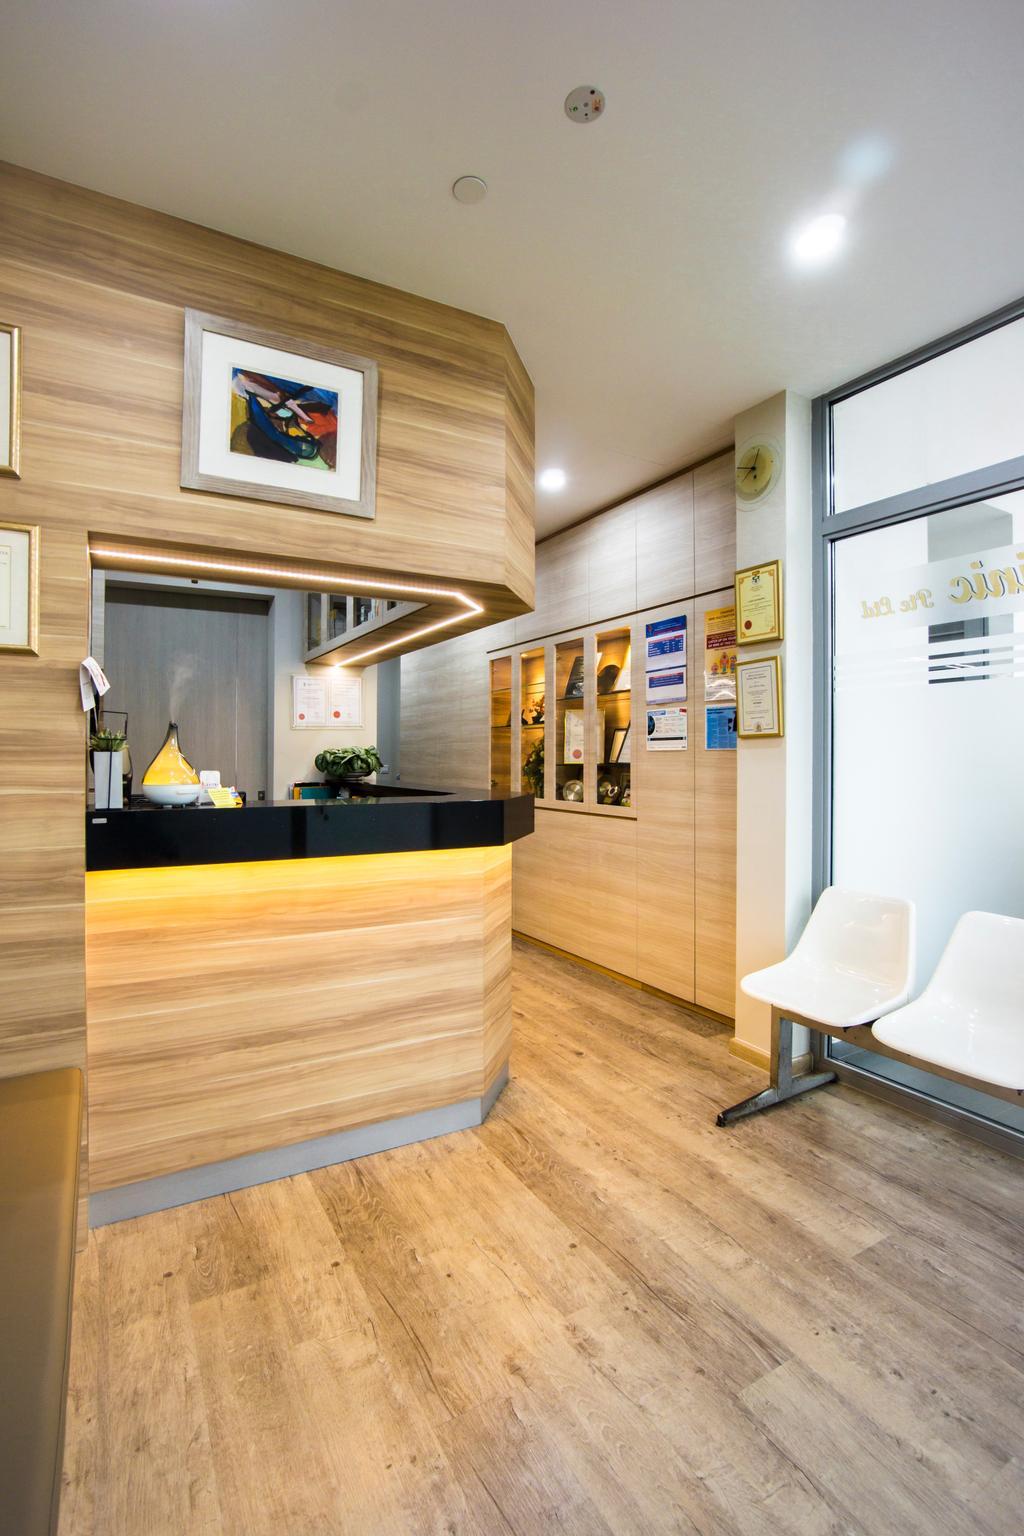 Chung Kiaw @ Bukit Timah, Commercial, Interior Designer, Flo Design, Contemporary